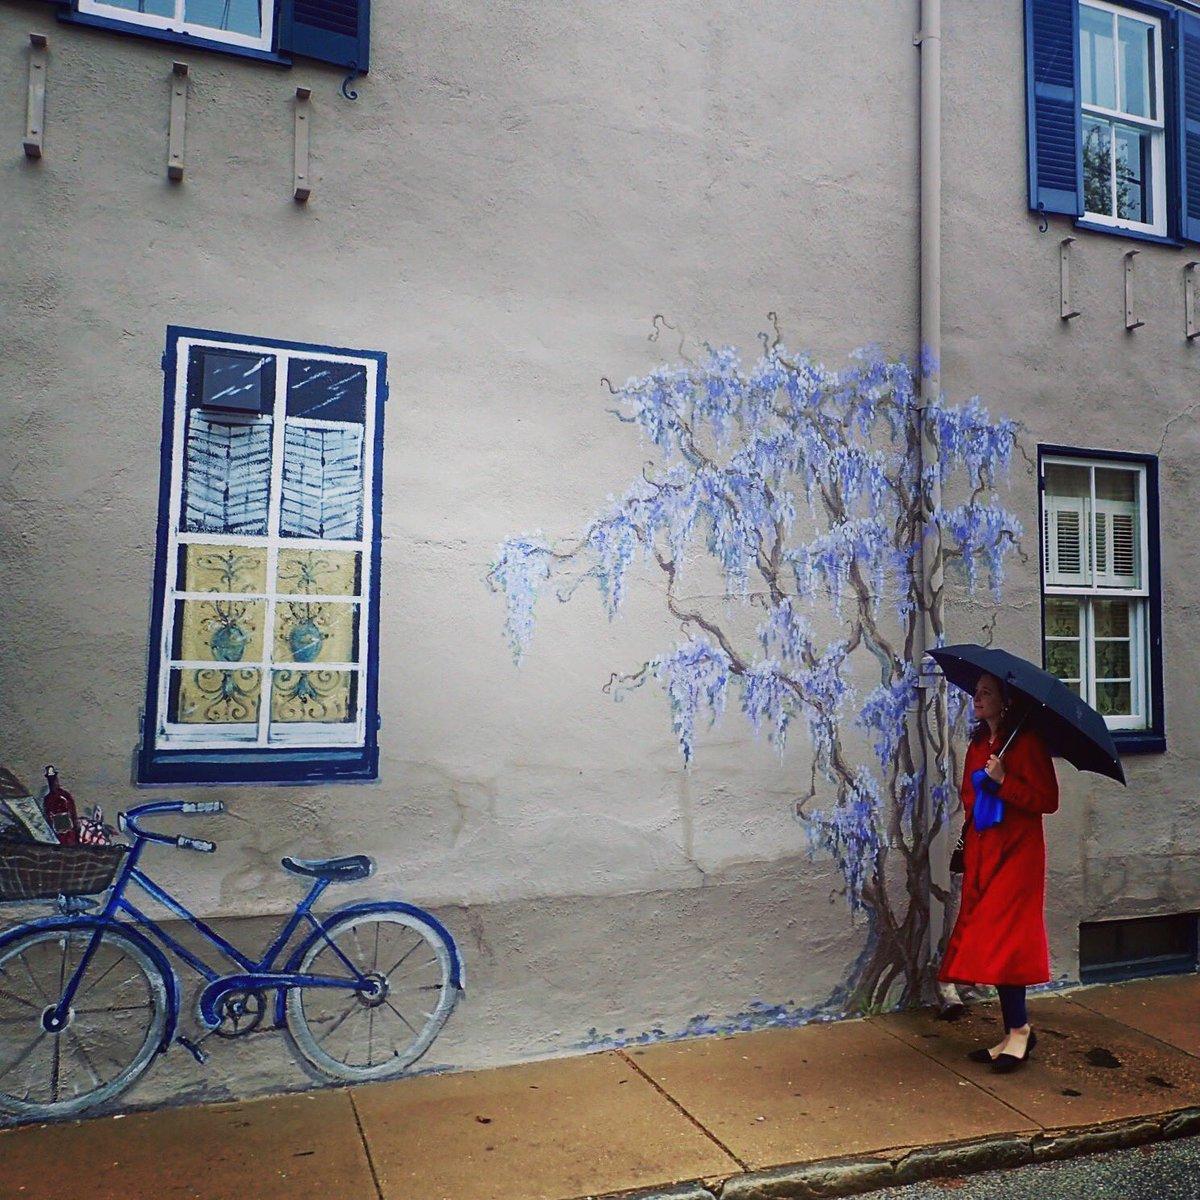 Annapolis wall art  -- what's real and what's not? #wallart #graffiti #rain #Annapolis